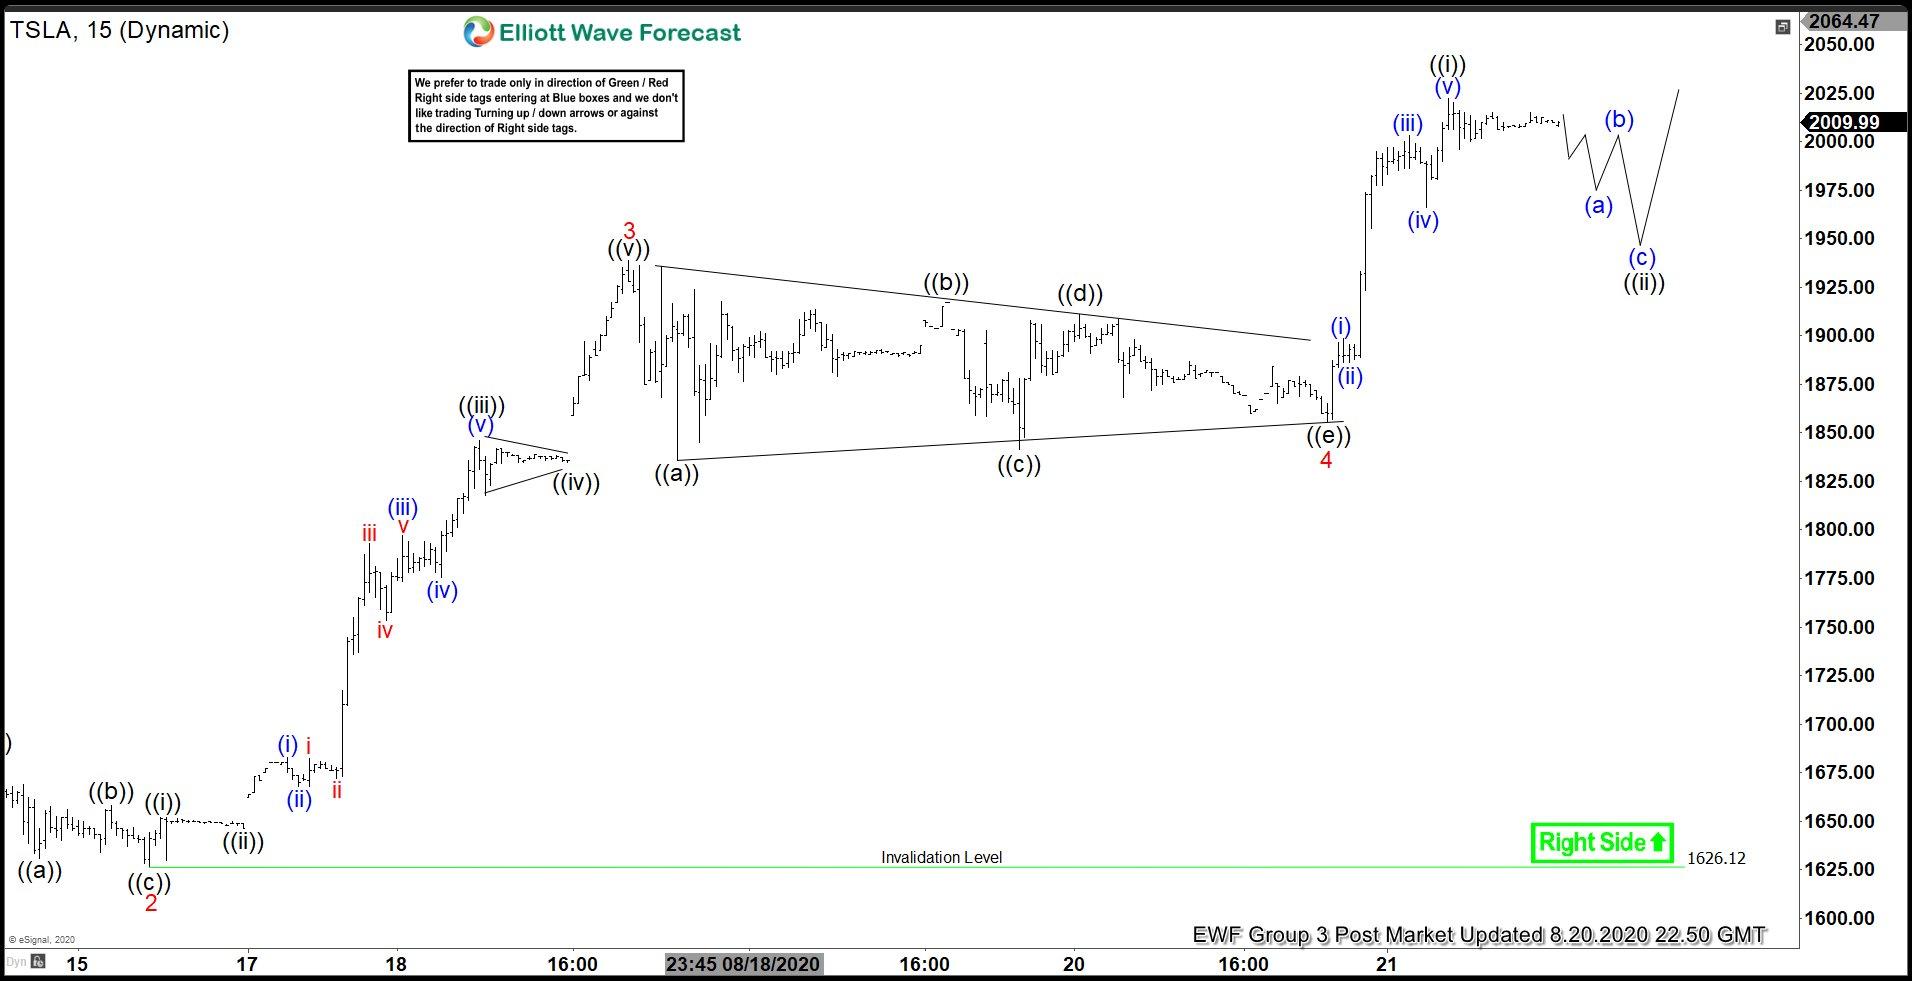 Elliott Wave View: Tesla (TSLA) Ending Wave 5